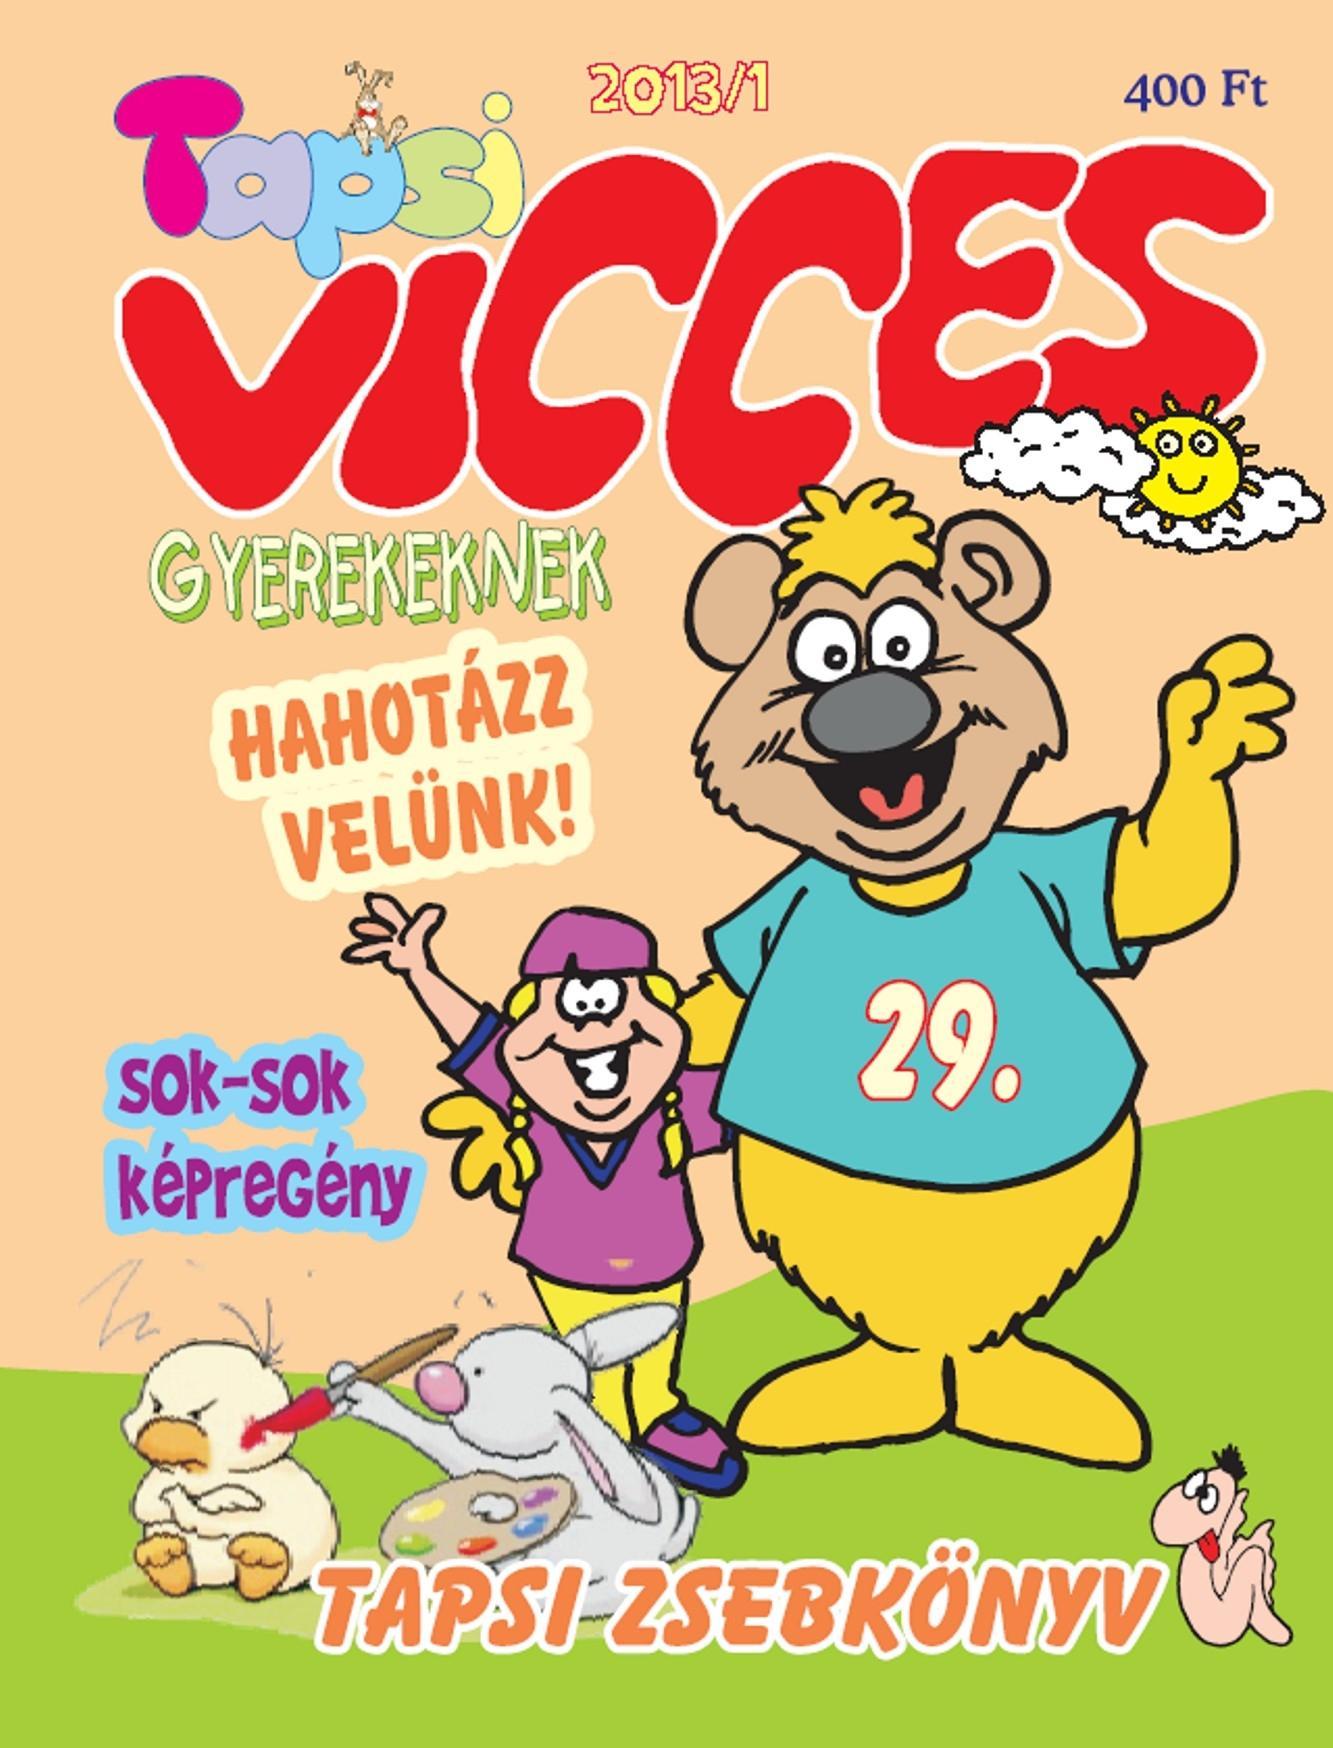 VICCES TAPSI - 2013/1